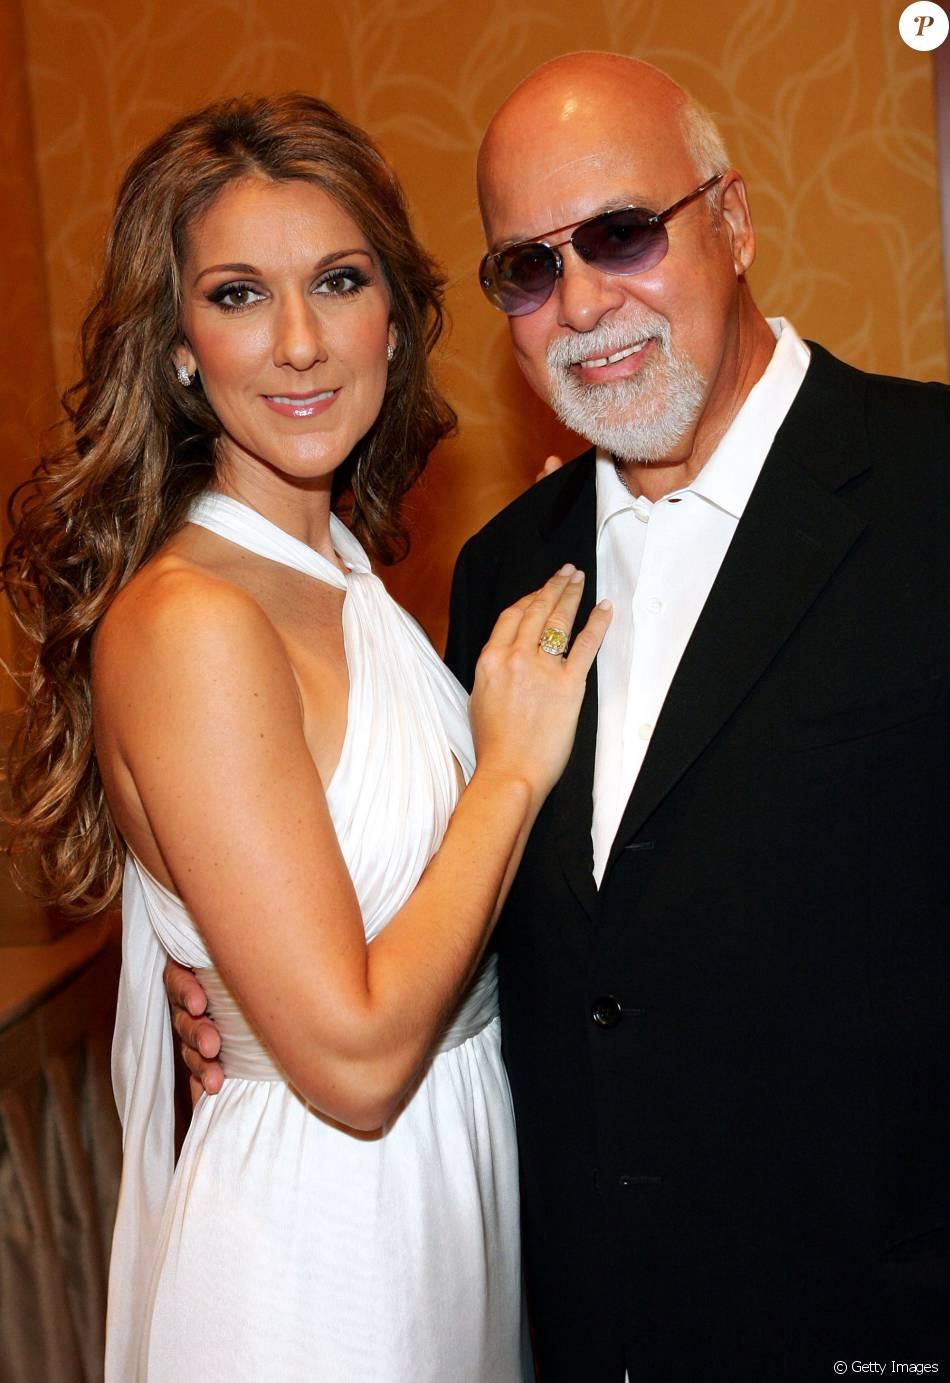 Céline Dion lamentou a morte do marido, René Angélil, nesta quinta-feira, 14 de dezembro de 2016.